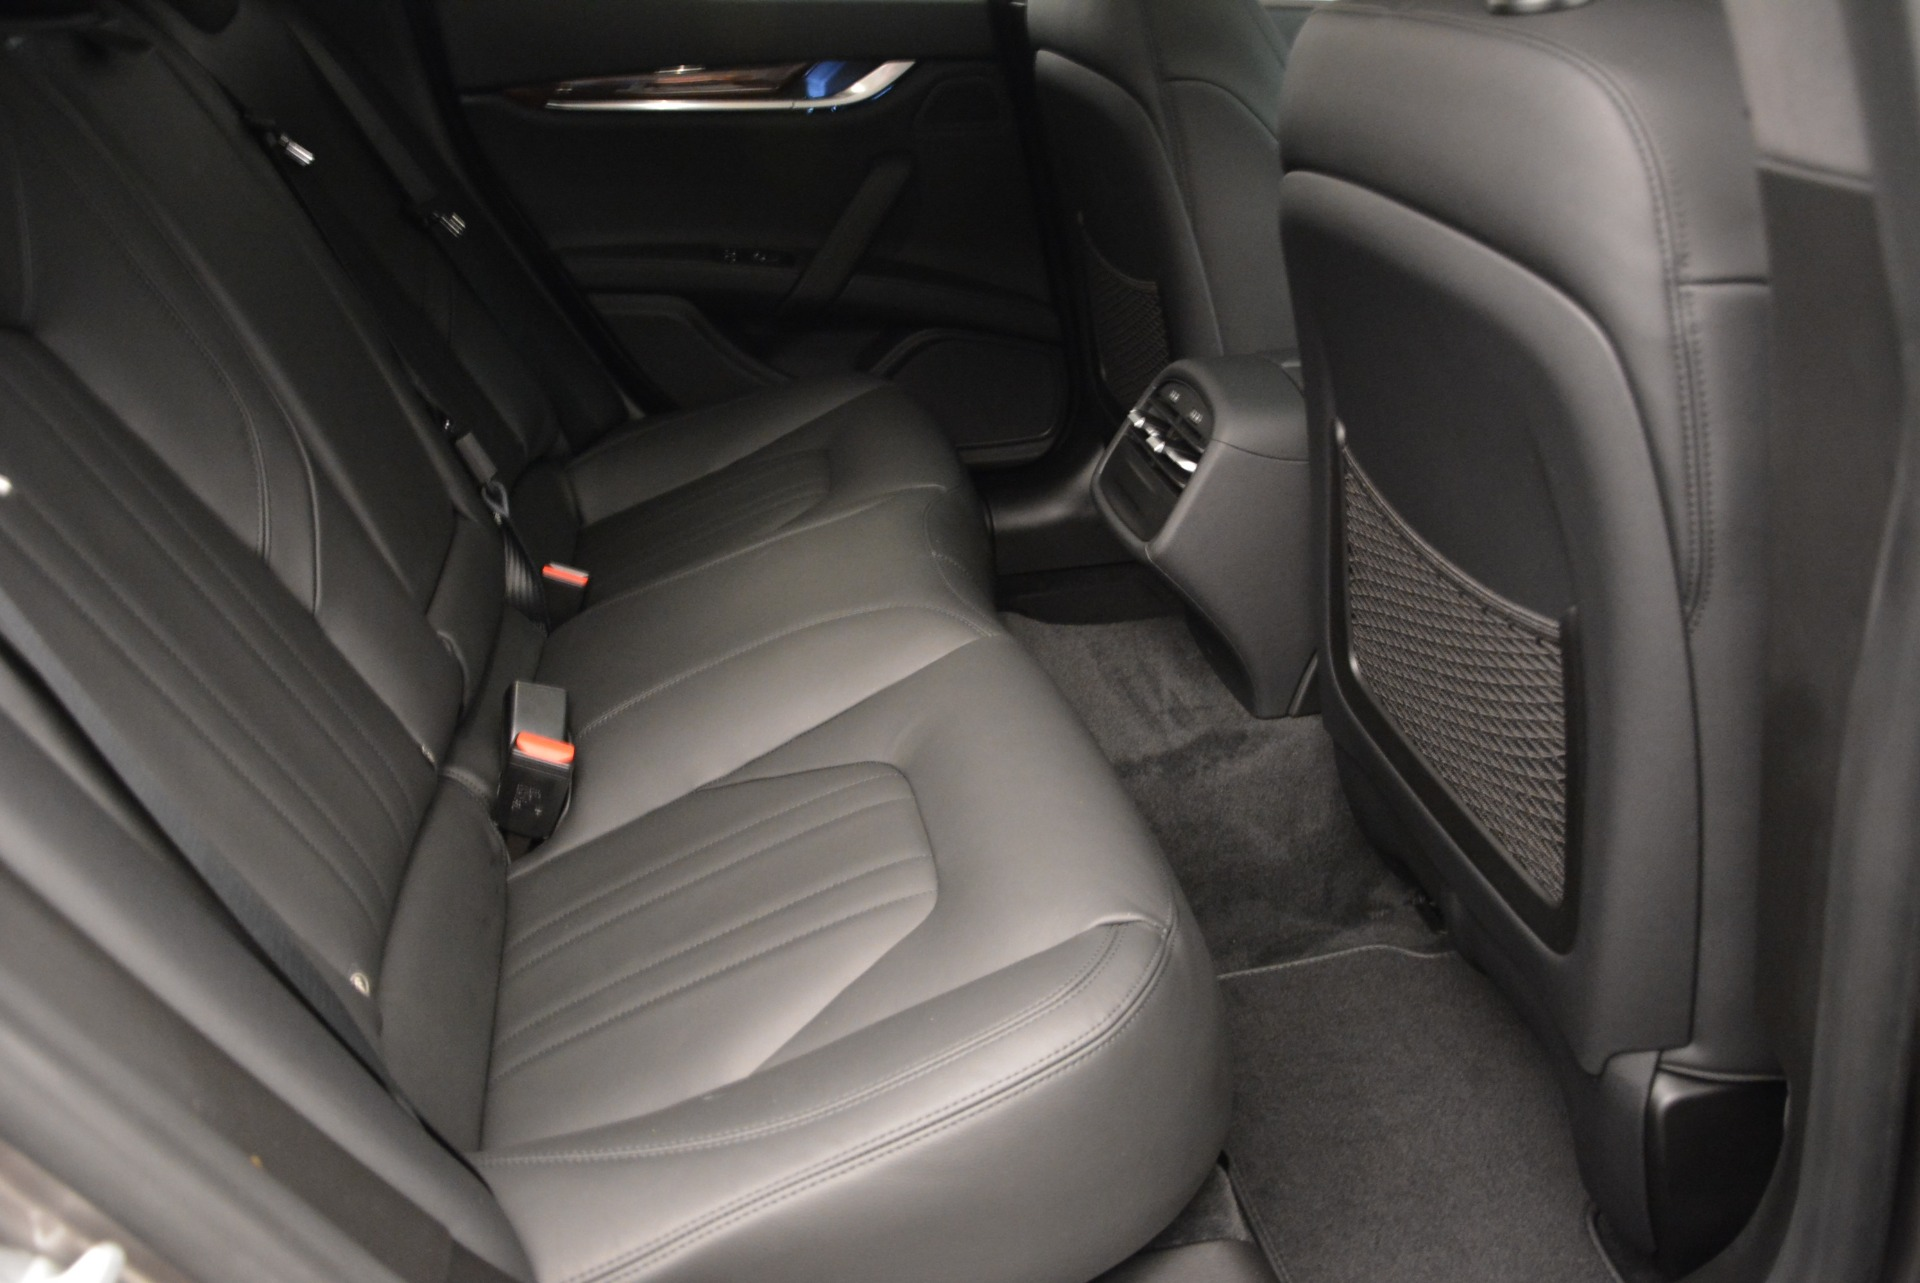 Used 2014 Maserati Ghibli S Q4 For Sale In Greenwich, CT 2562_p24